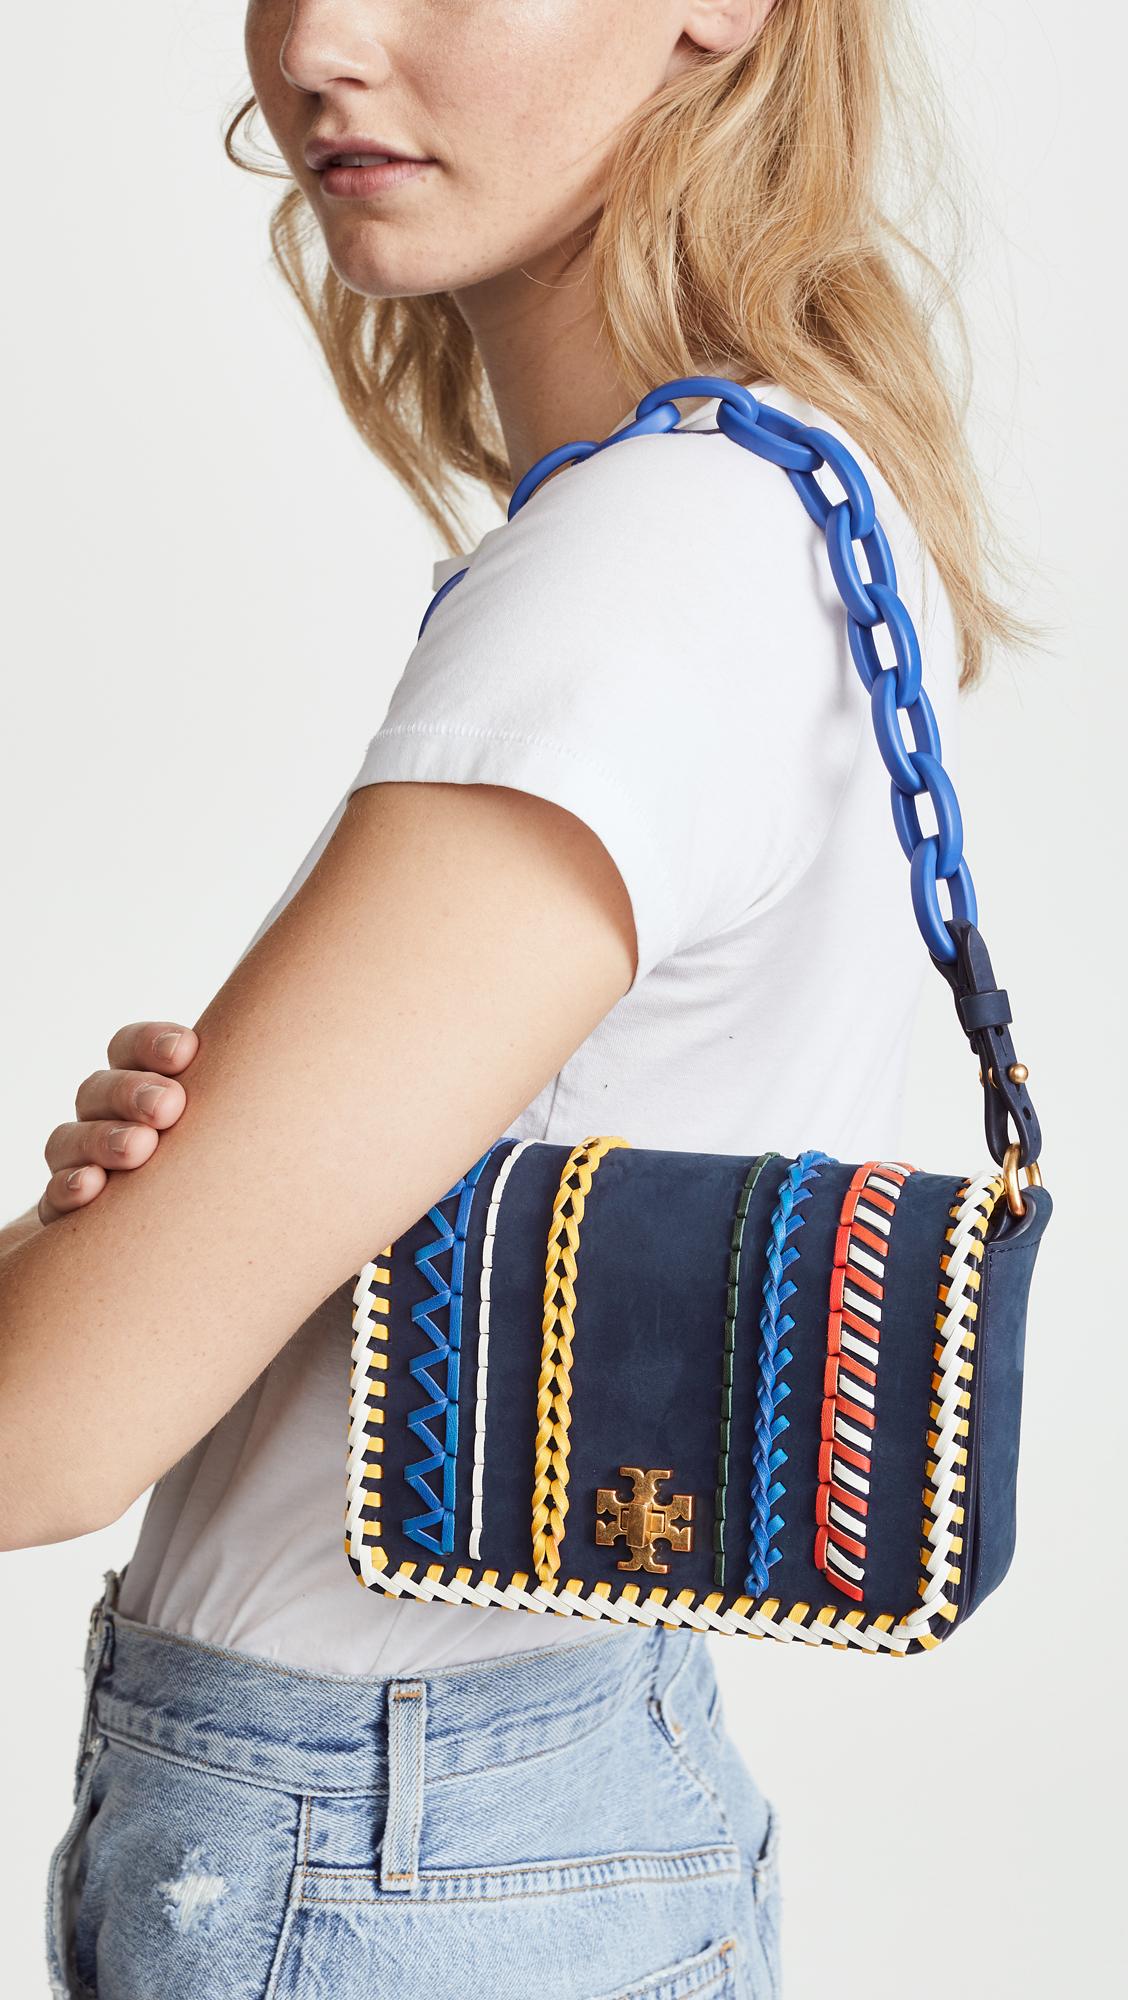 7425b44670b8 Tory Burch Kira Whipstitch Double Strap Mini Bag